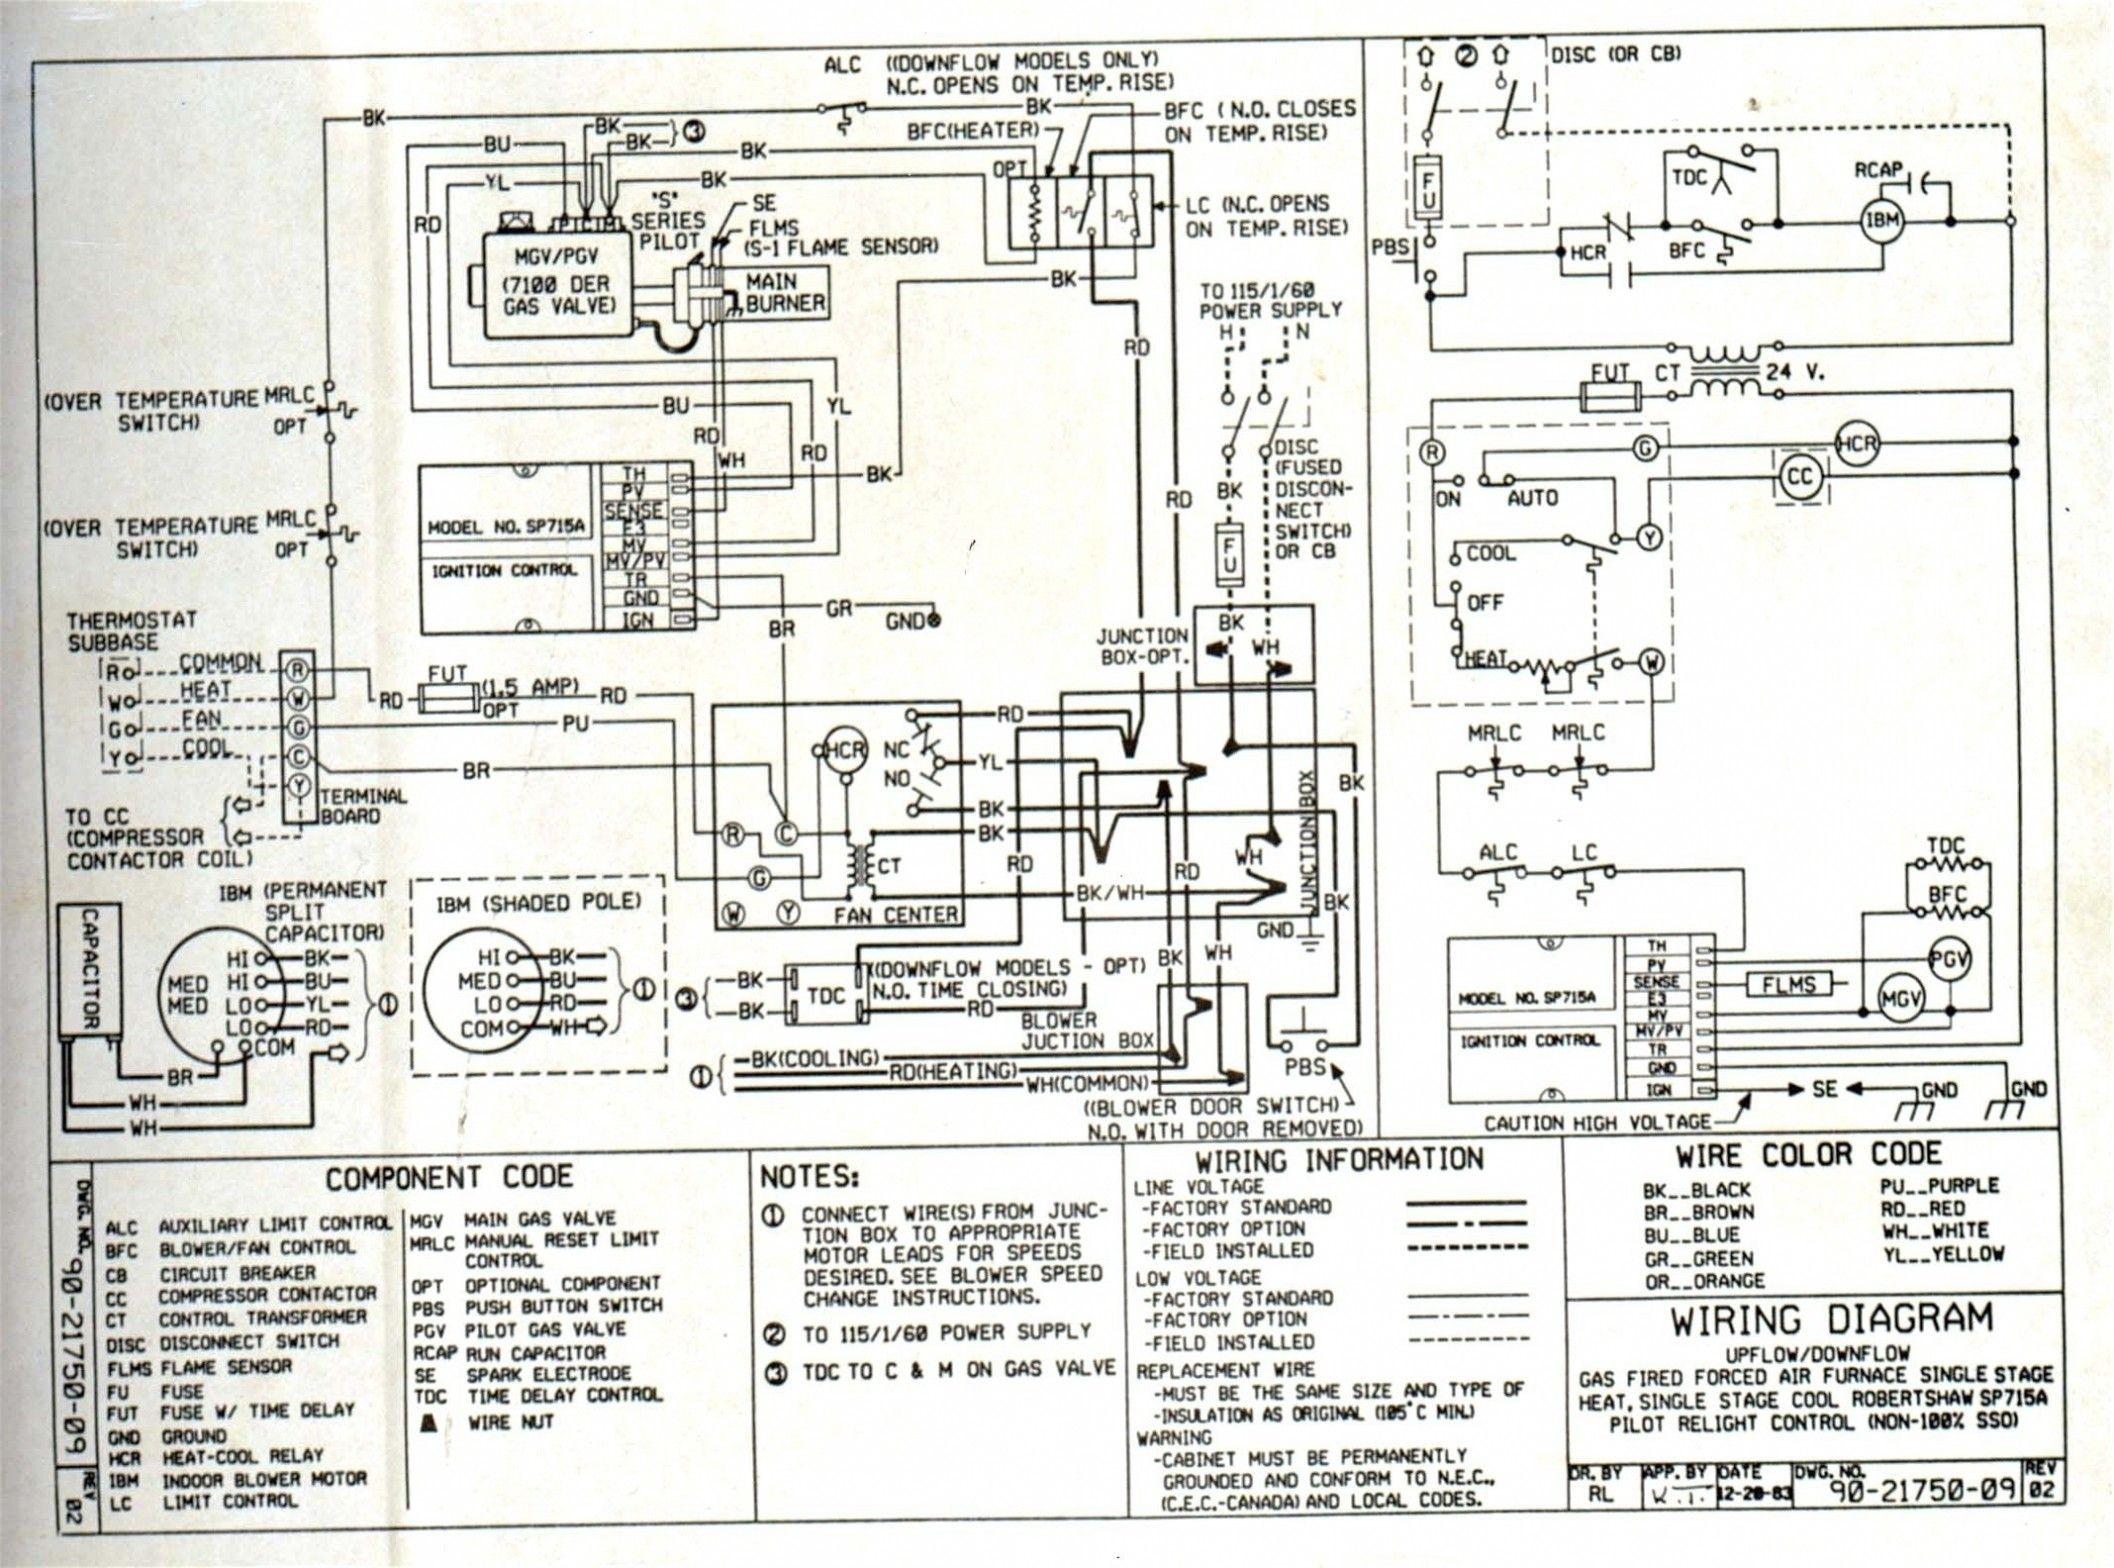 House Wiring Diagram Pdf Unique Electrical Riser Diagram Template Diagram Of House Wiring Diagram Pdf